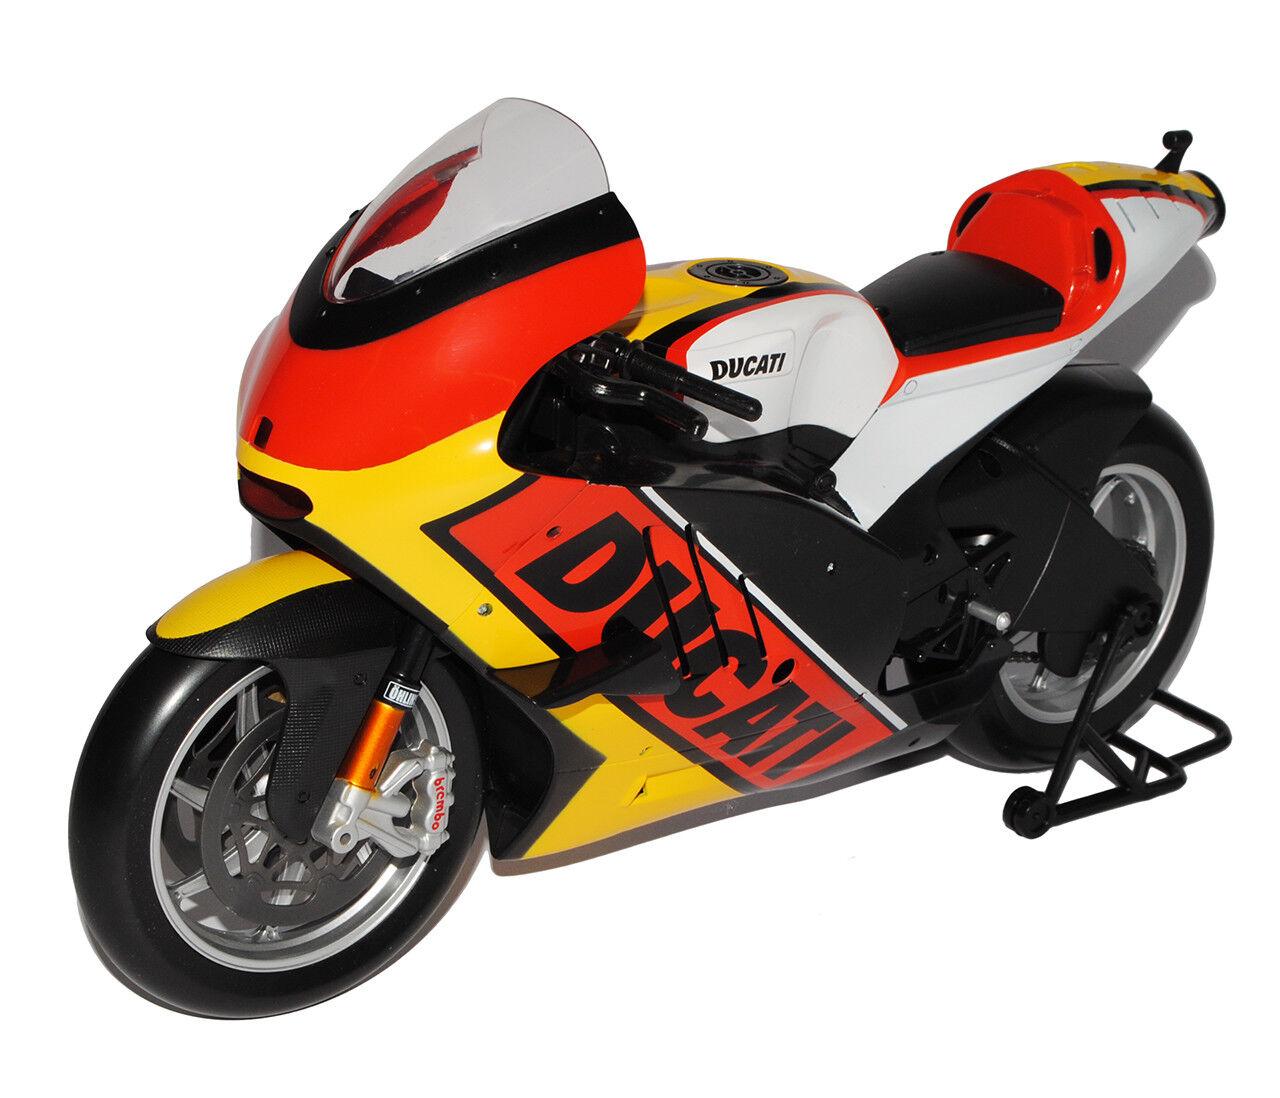 Ducati Desmosedici Flaggen Deutschland Design Germany Germany Germany 1 6 Maisto Modell Motorr.. 221c39